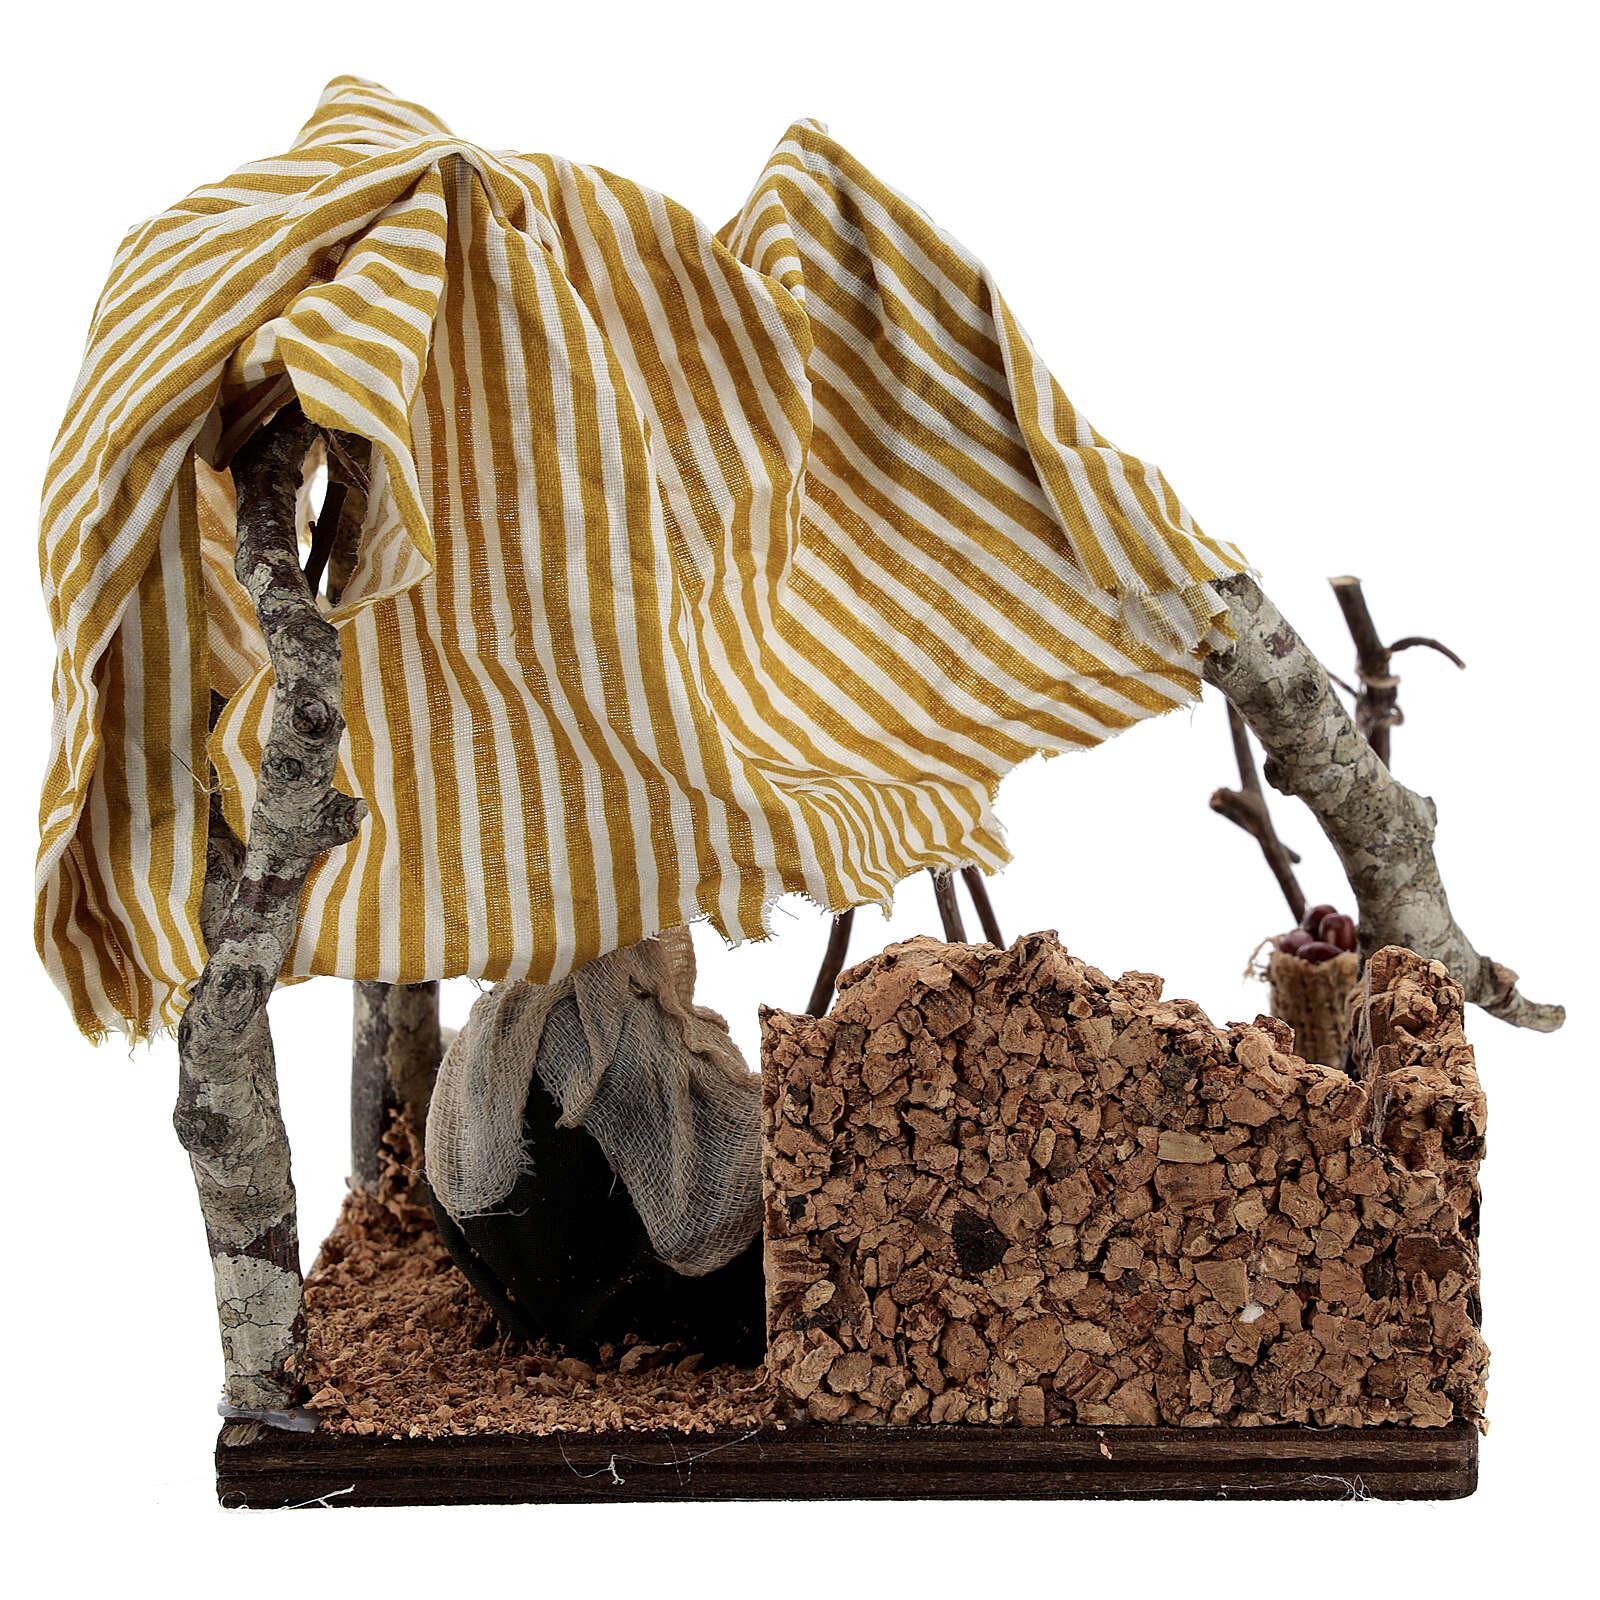 Tent with bivouac Neapolitan Nativity scene 10 cm 4